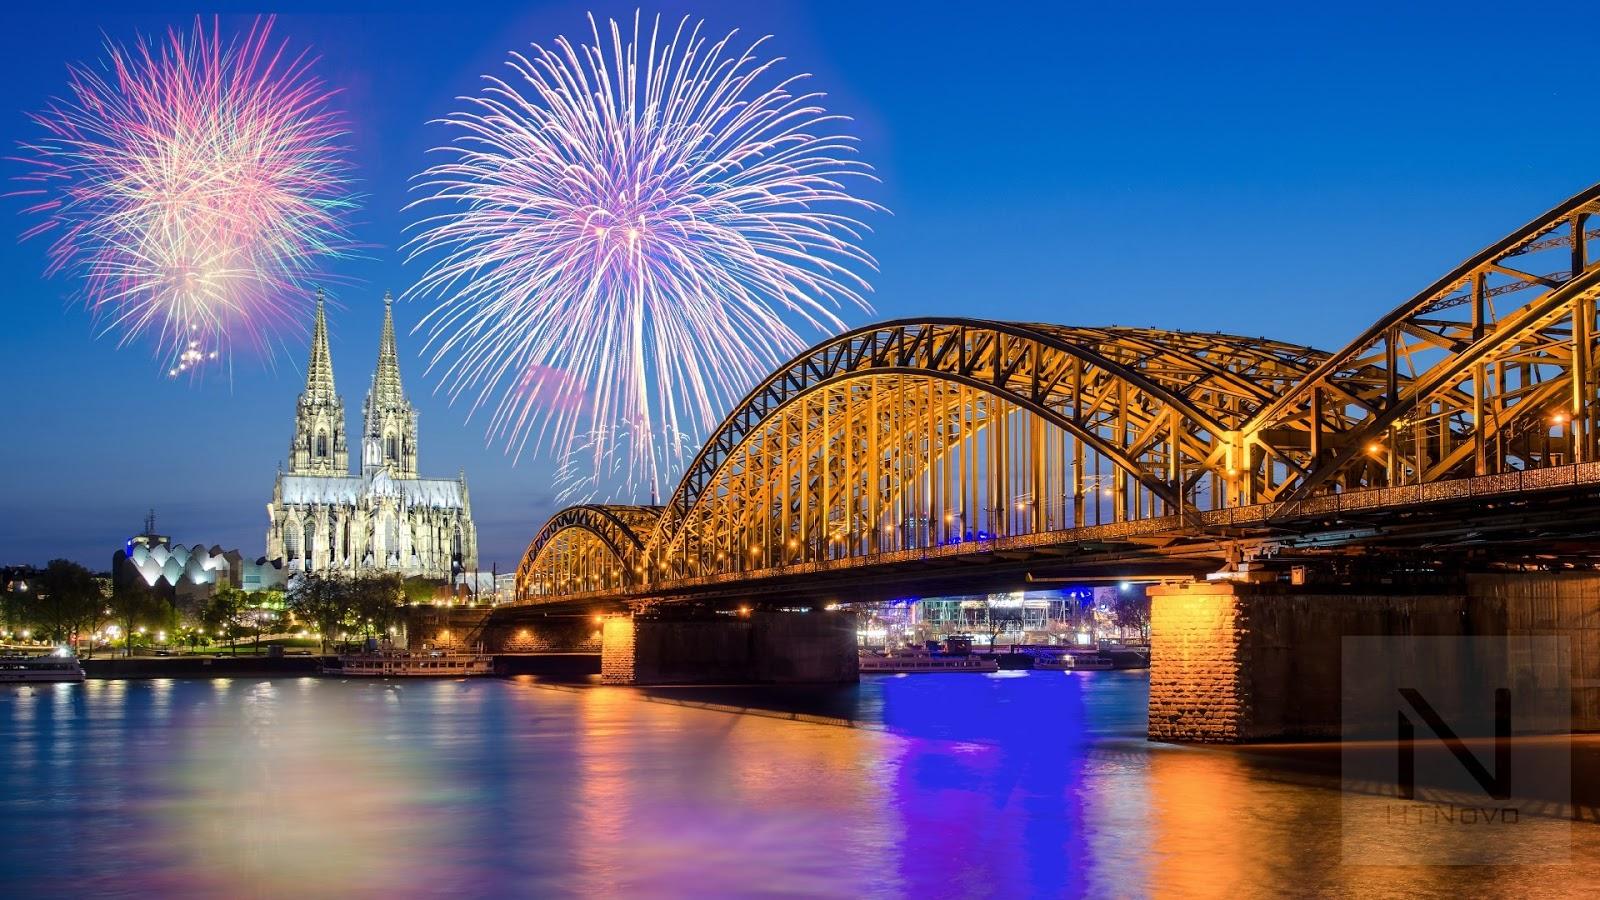 Fireworks-on-New-Year's-Tema-Windows-10